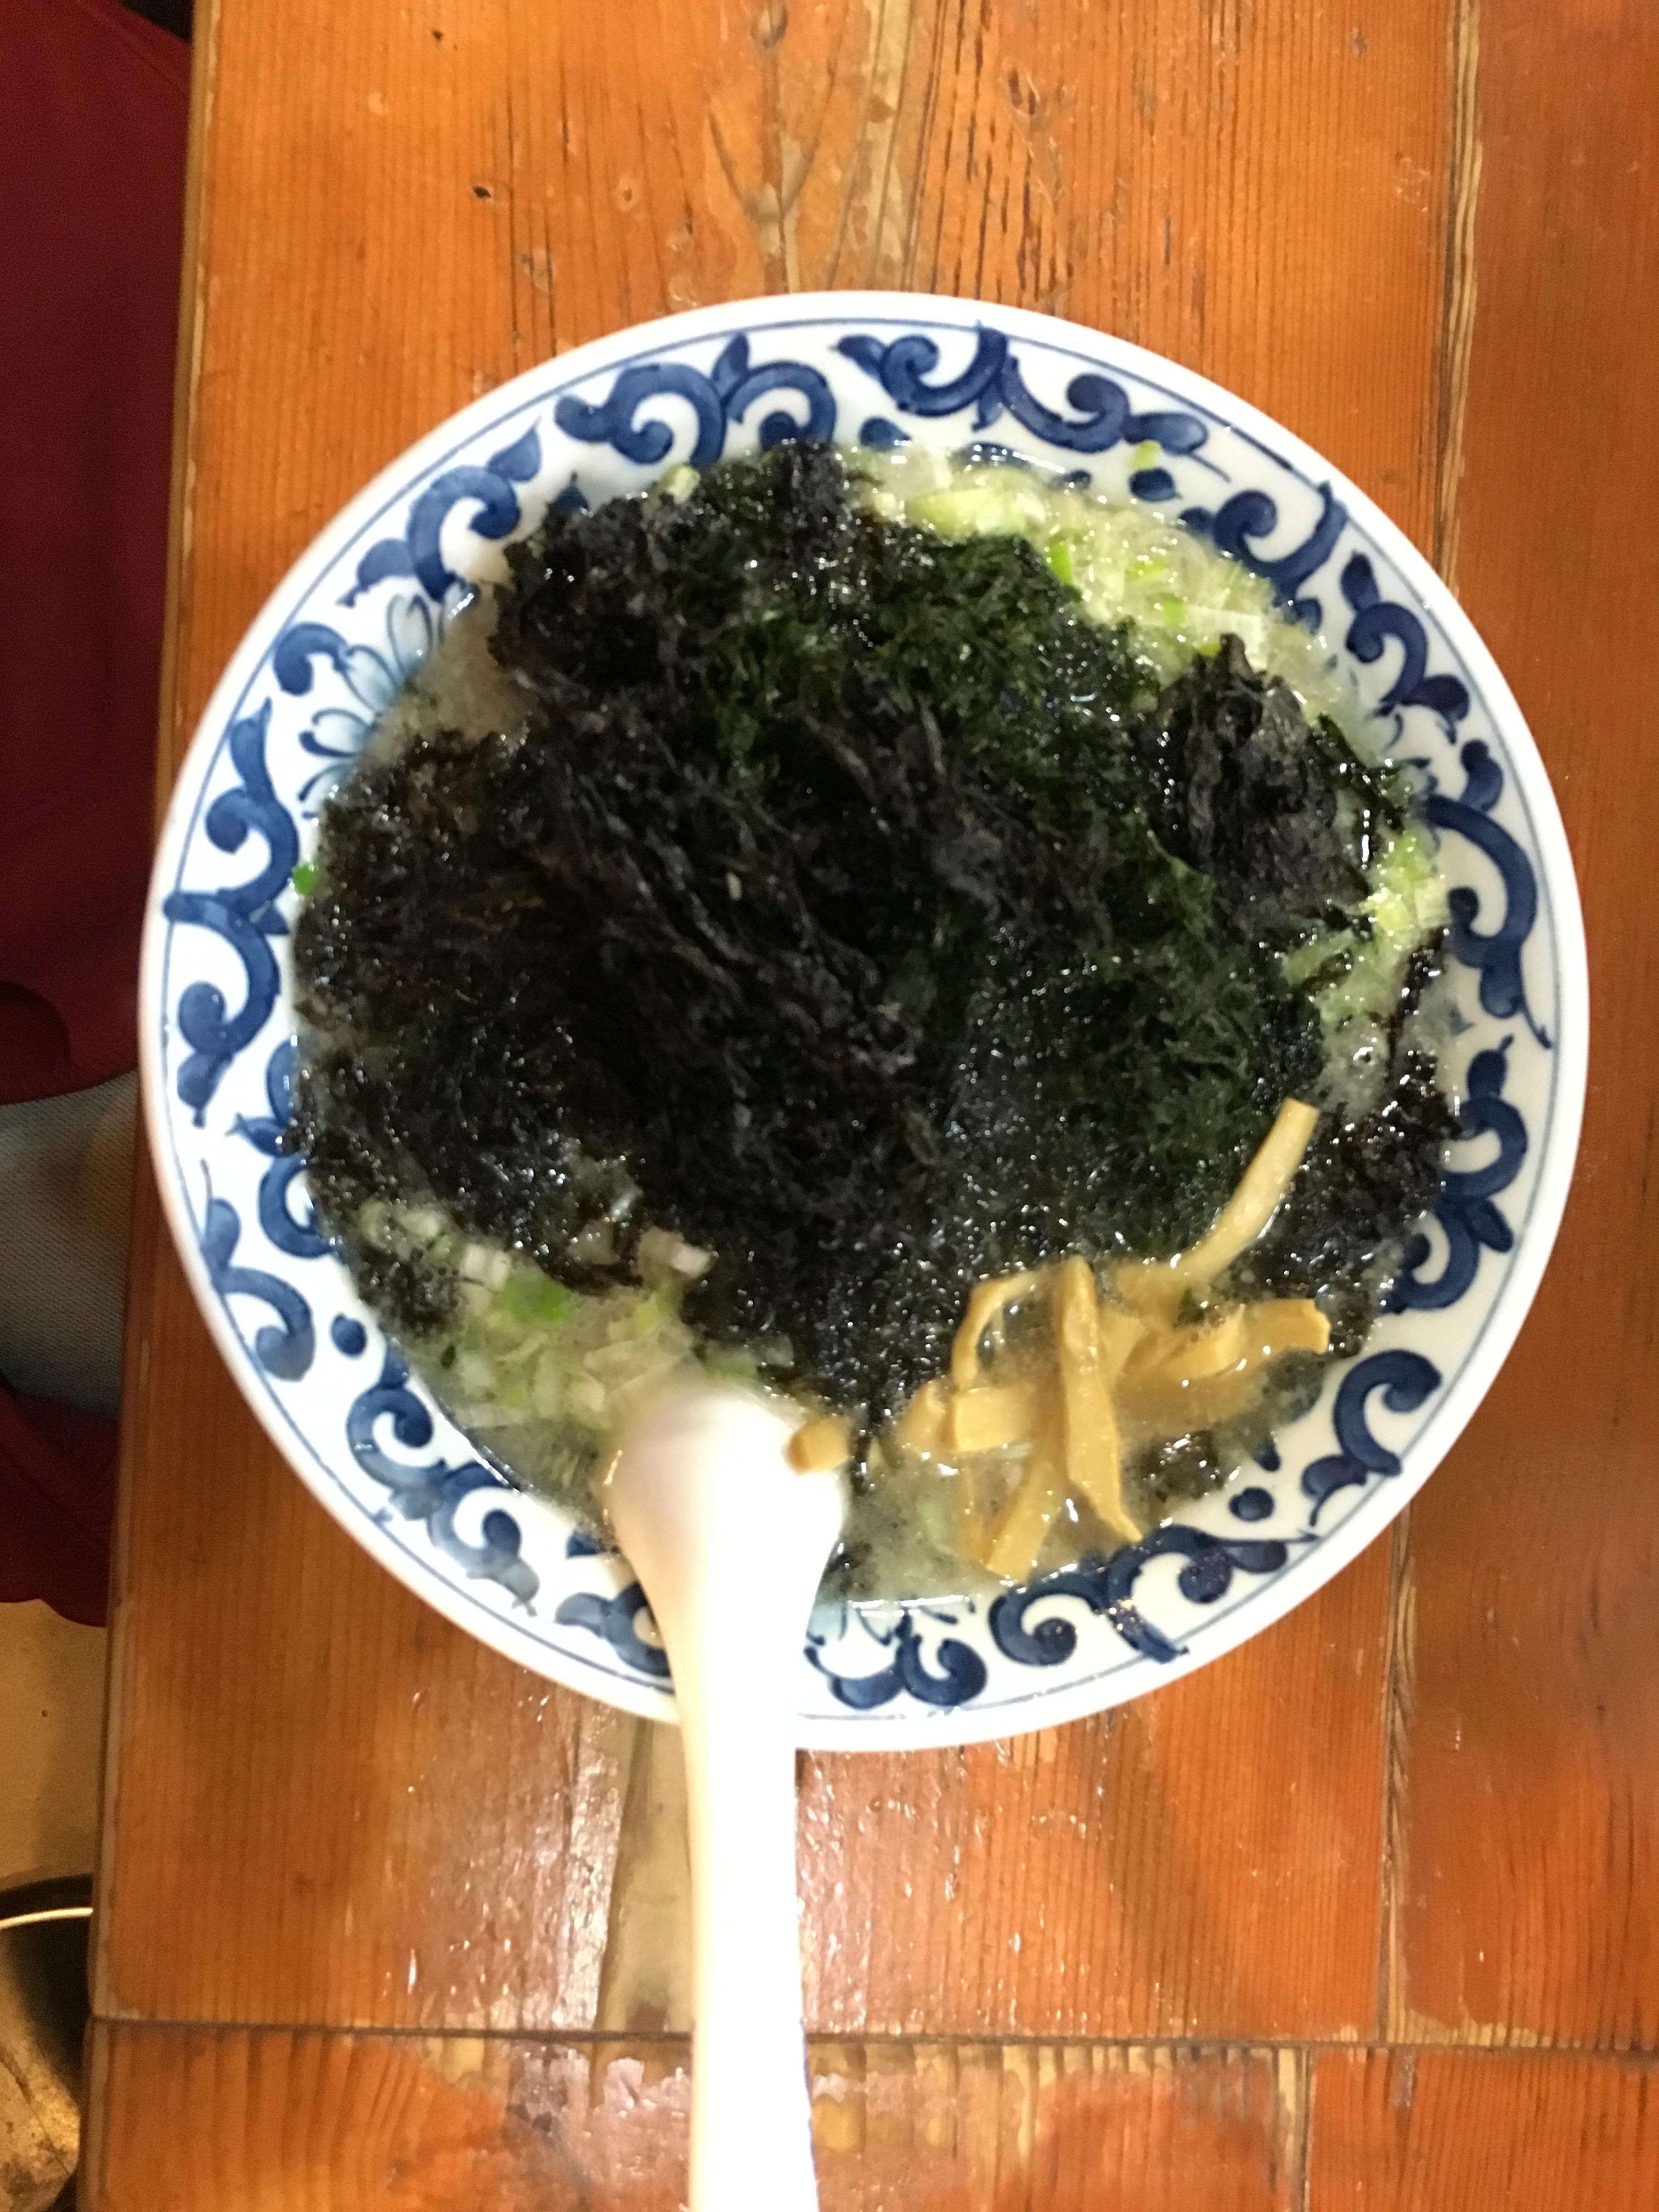 noodles,japanese,tasty,restaurant,seaweed,ramen